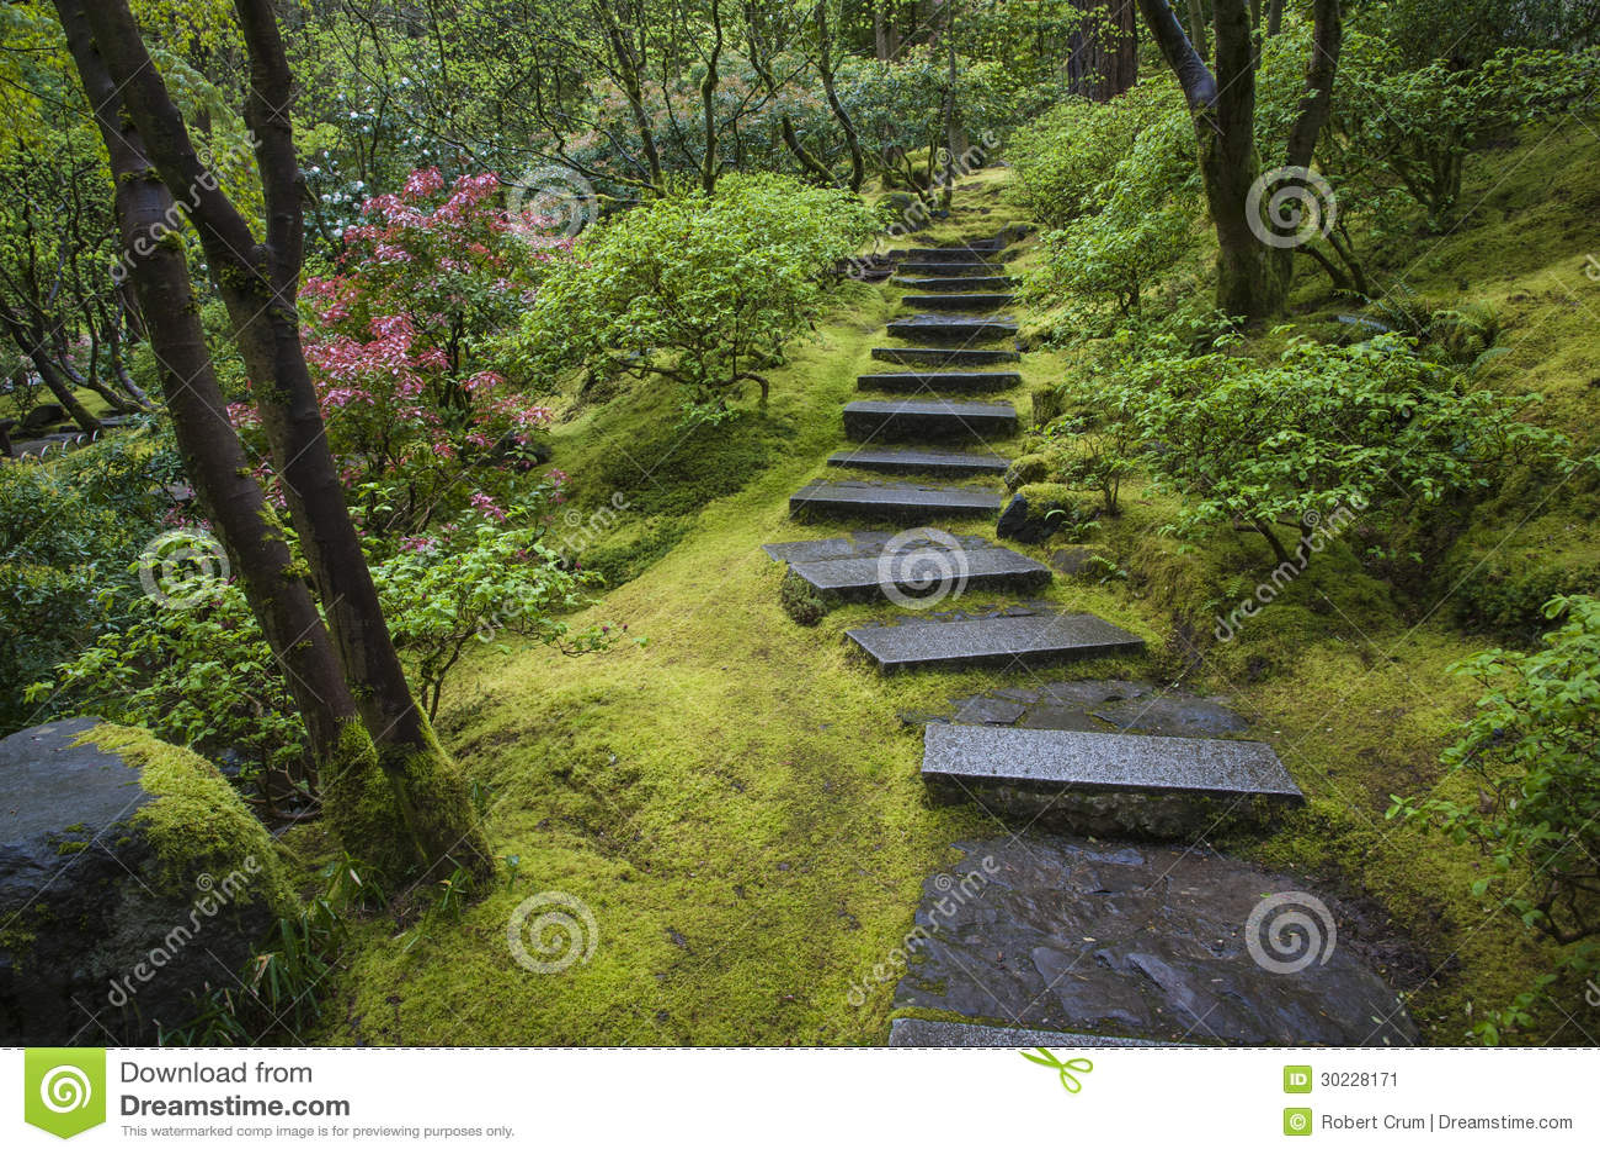 Escalier en pierre dans un jardin image stock image 30228171 for Escalier dans un jardin